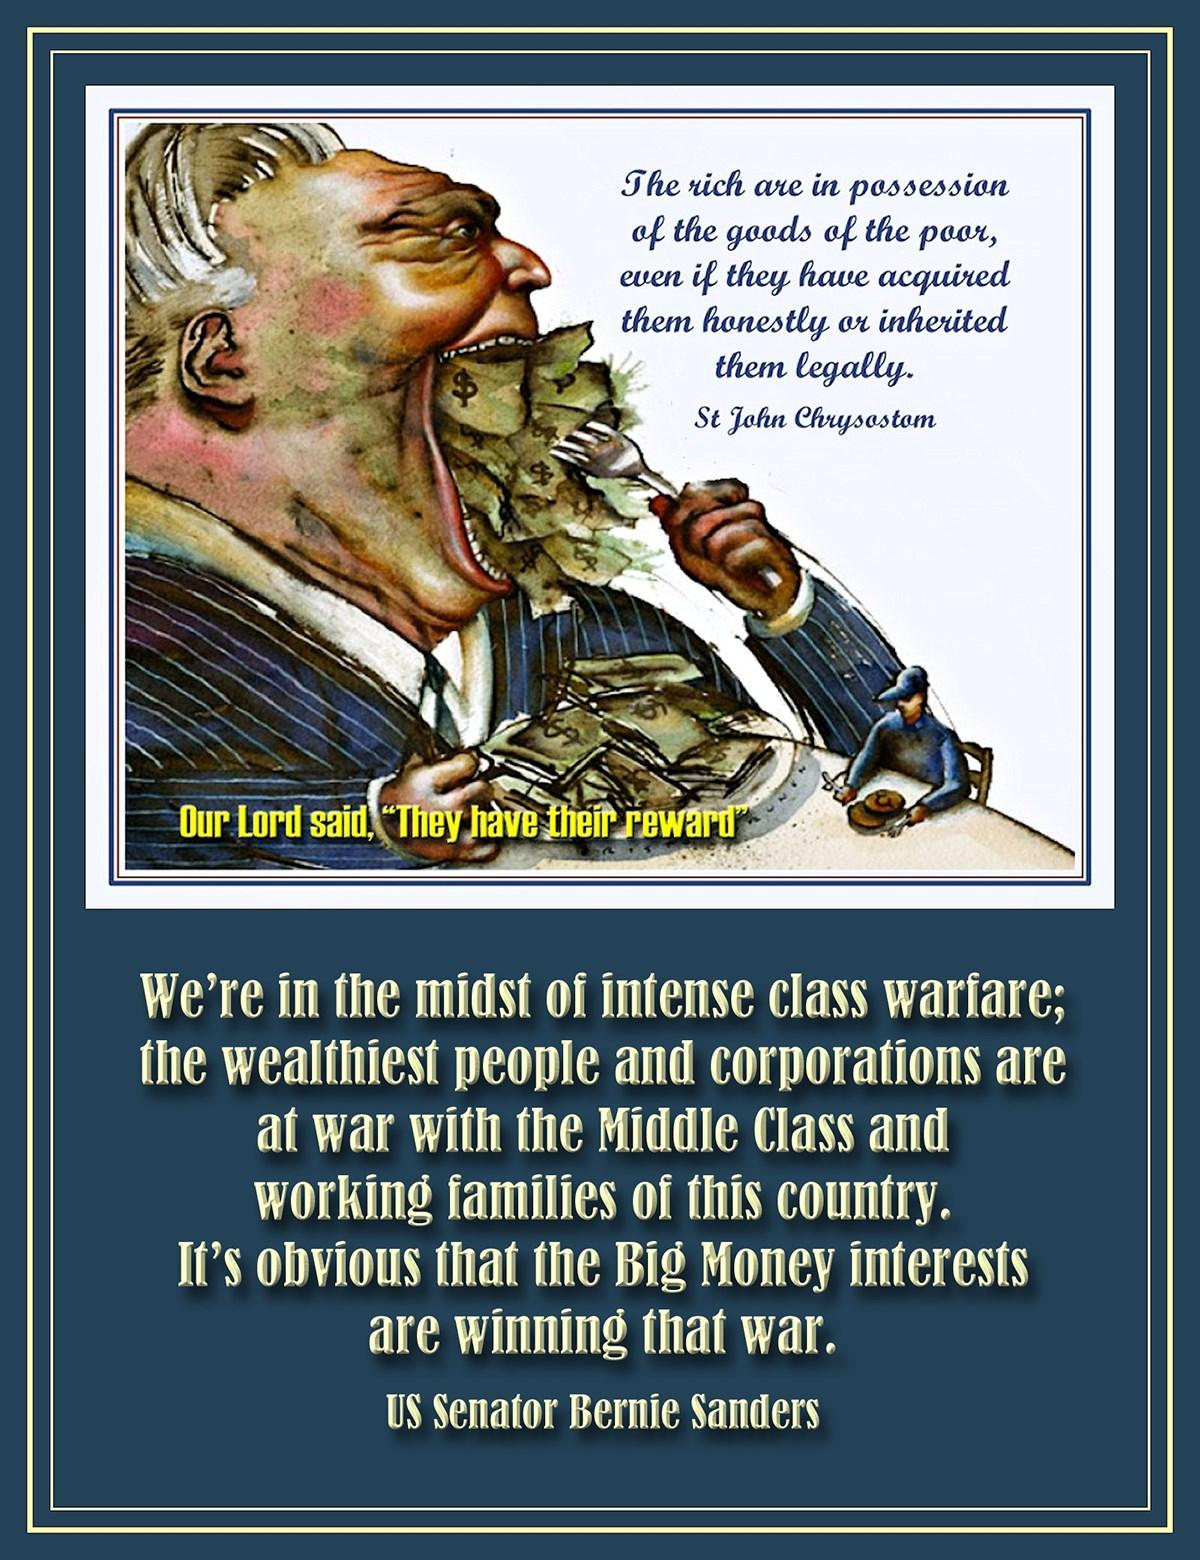 00 Bernie Sanders. rich man. 09.06.15